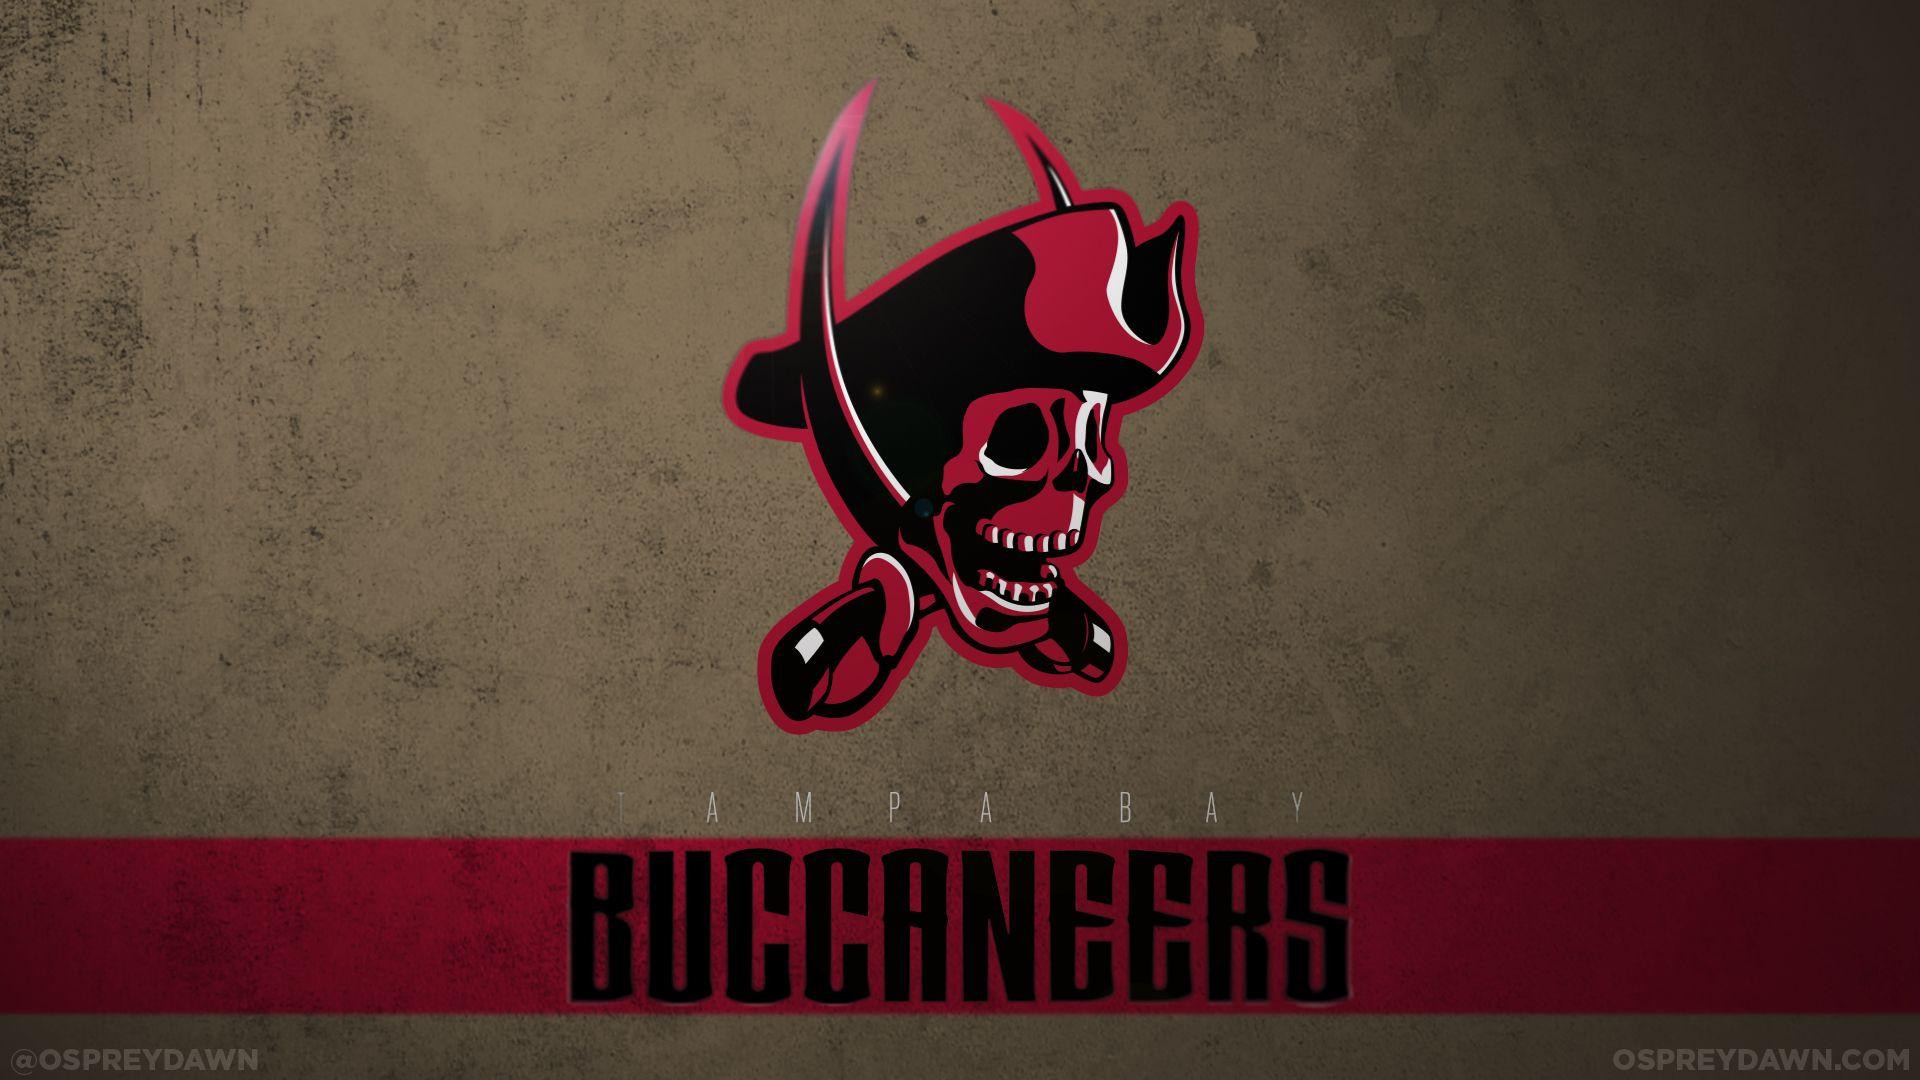 Tampa Bay Buccaneers Wallpapers Hd Wallpapers Early Nfl Teams Logos Nfl Logo Tampa Bay Buccaneers Logo